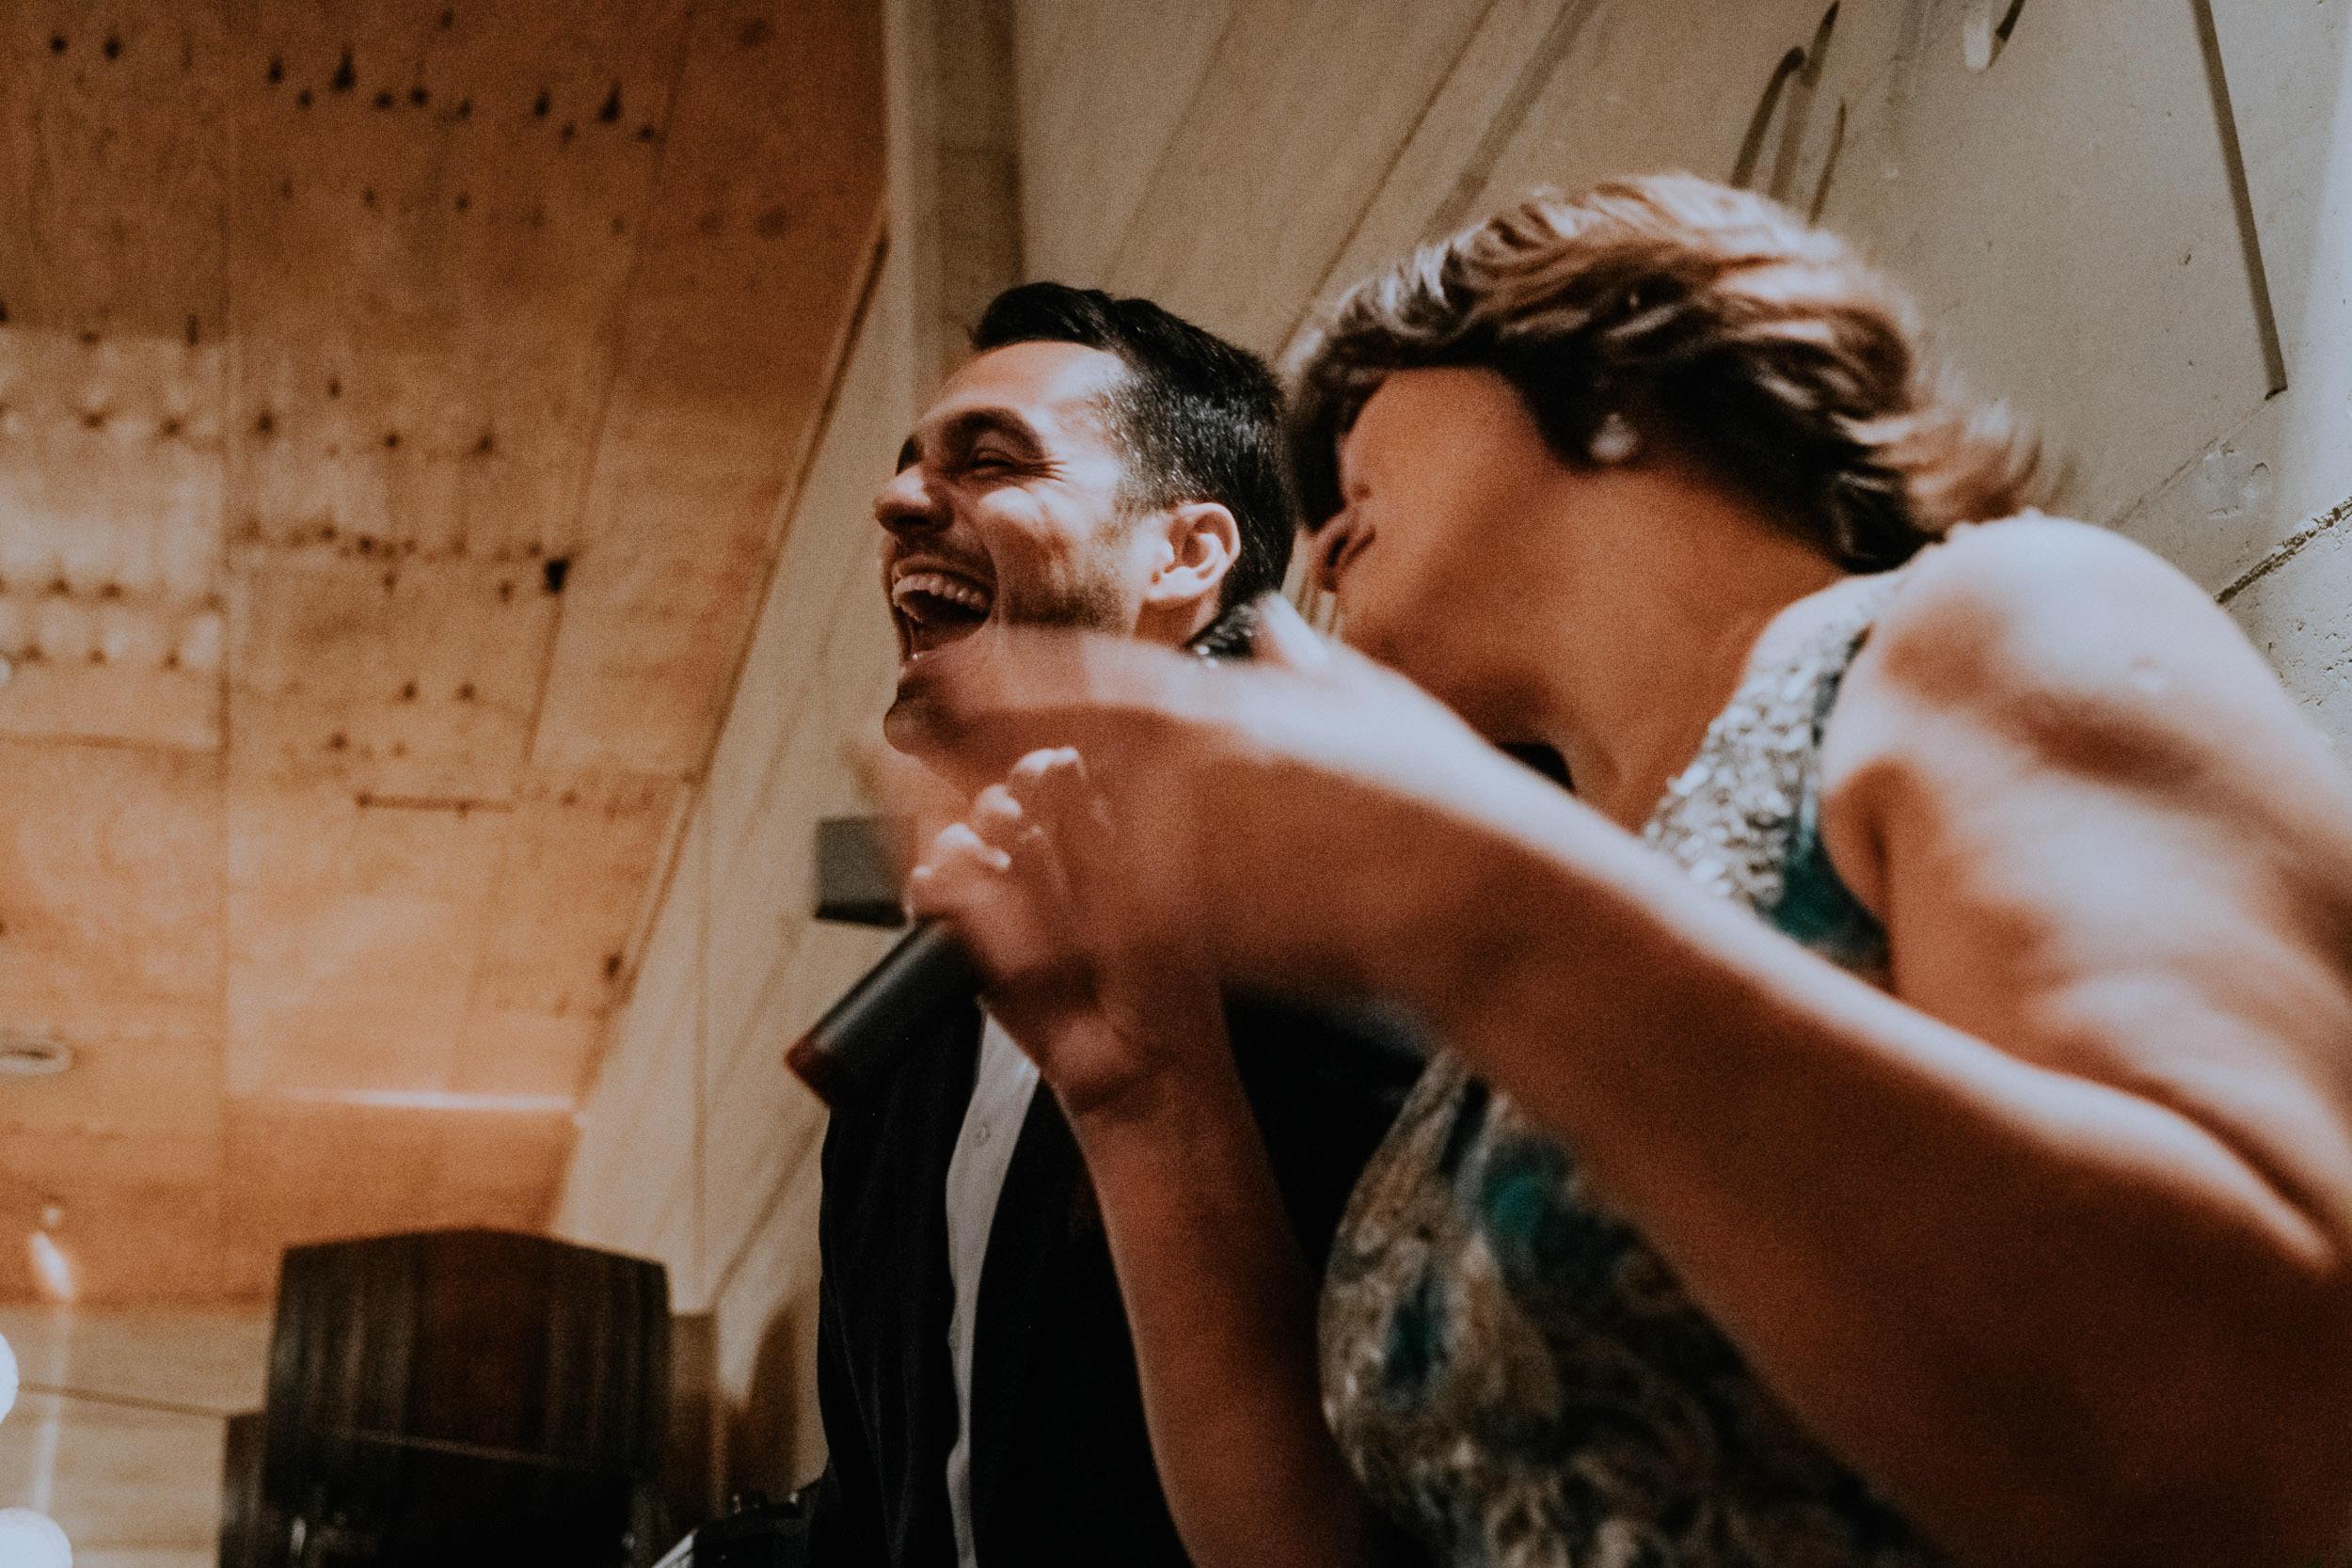 s+j_top_elopement wedding photography_kings & thieves_blog - 526.jpg